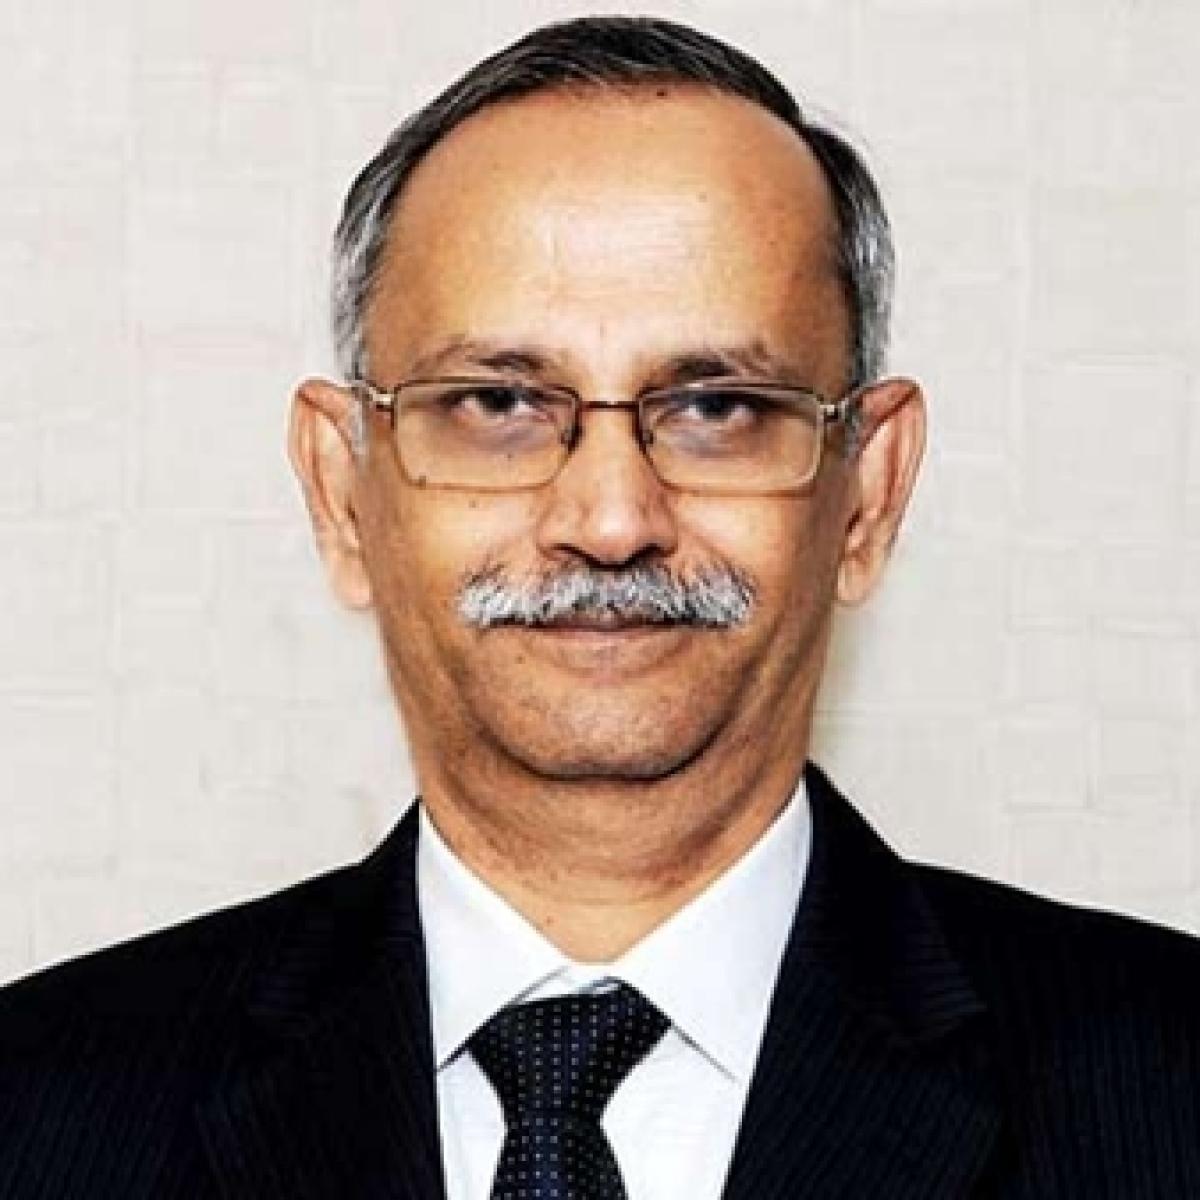 Equity investors should take brunt in YES Bank: AMFI